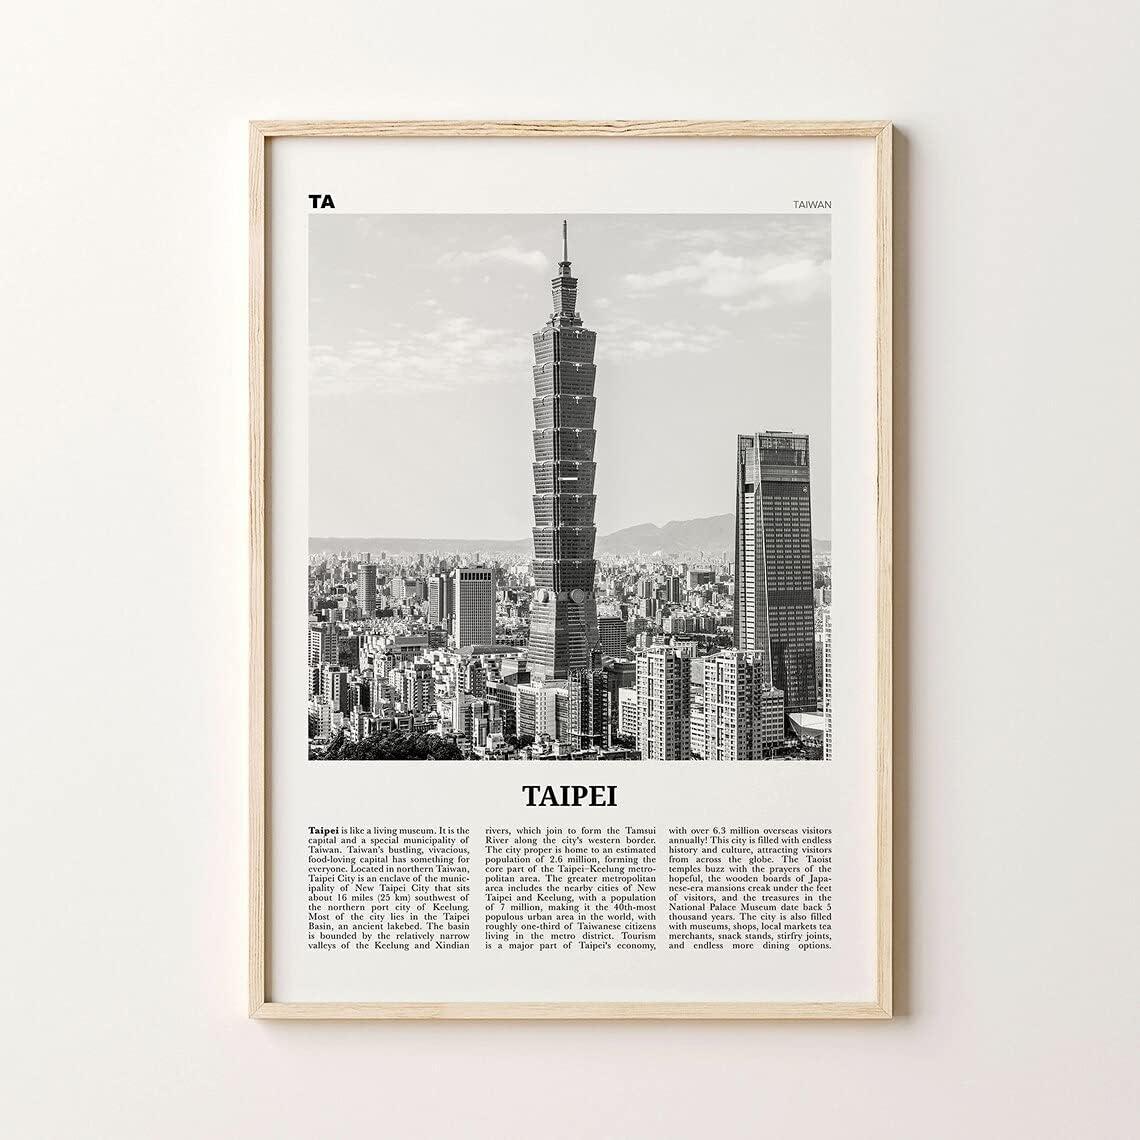 Taipei Print Black And White, Taipei Wall Art, Taipei Poster, Taipei Photo, Taipei Wall Decor, Taiwan, 臺北 臺北市 臺灣 中華民國, Asia